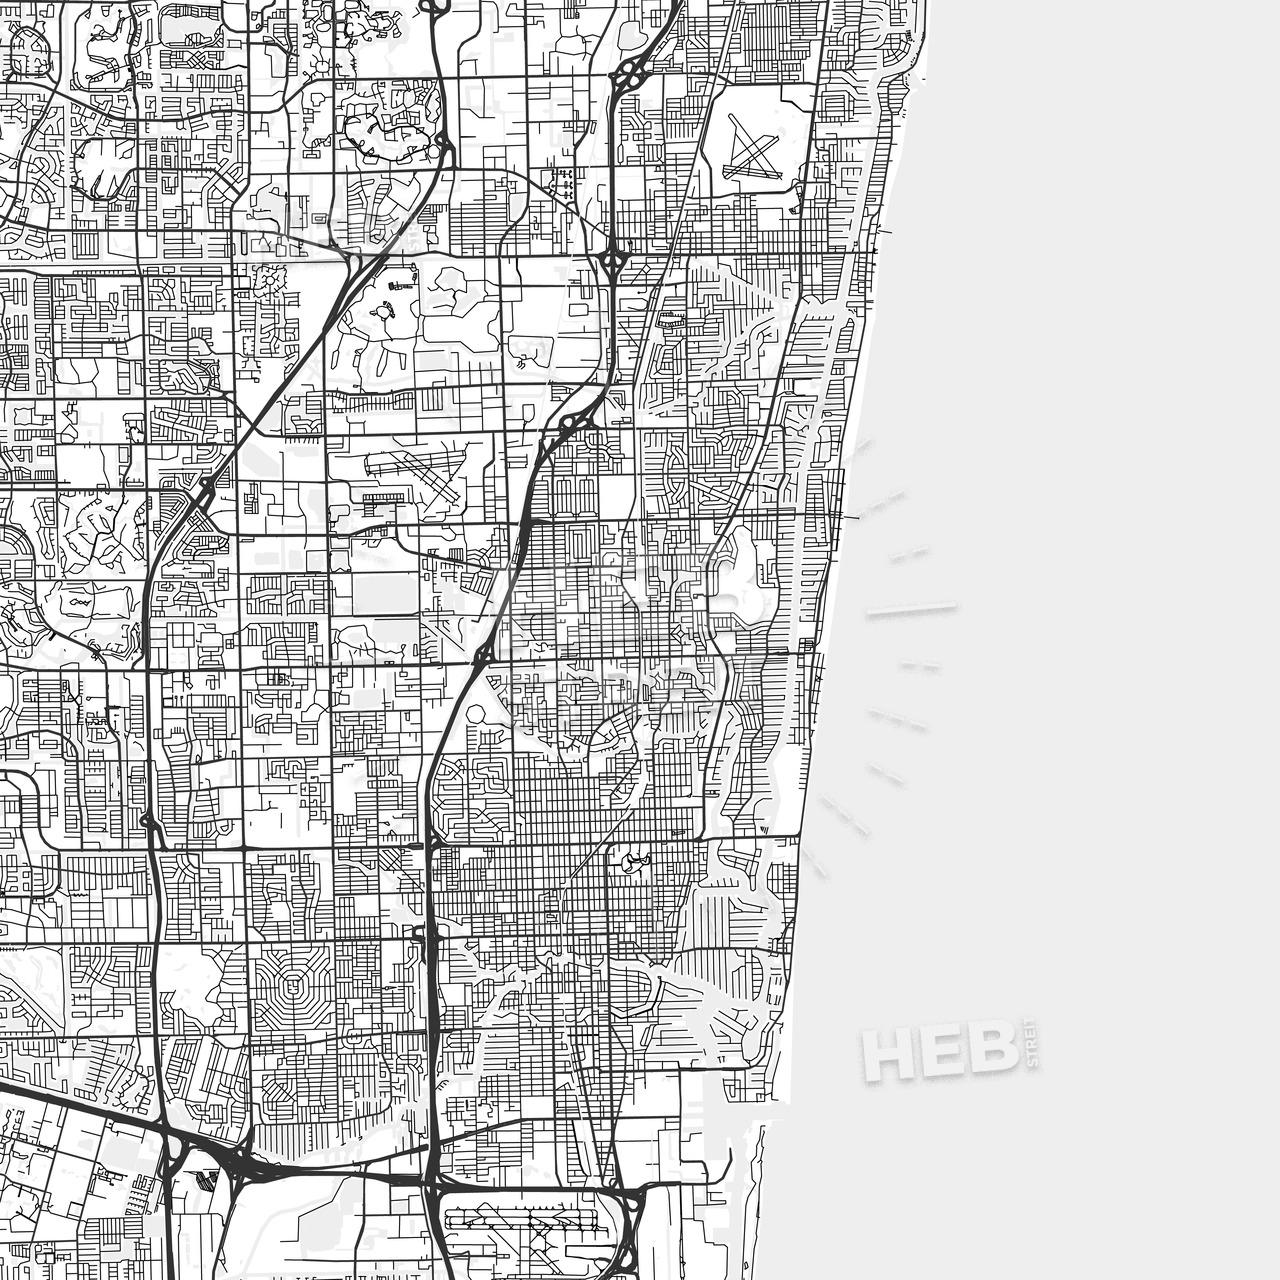 Oakland Park, Florida - Area Map - Light | Hebstreits - Oakland Park Florida Map